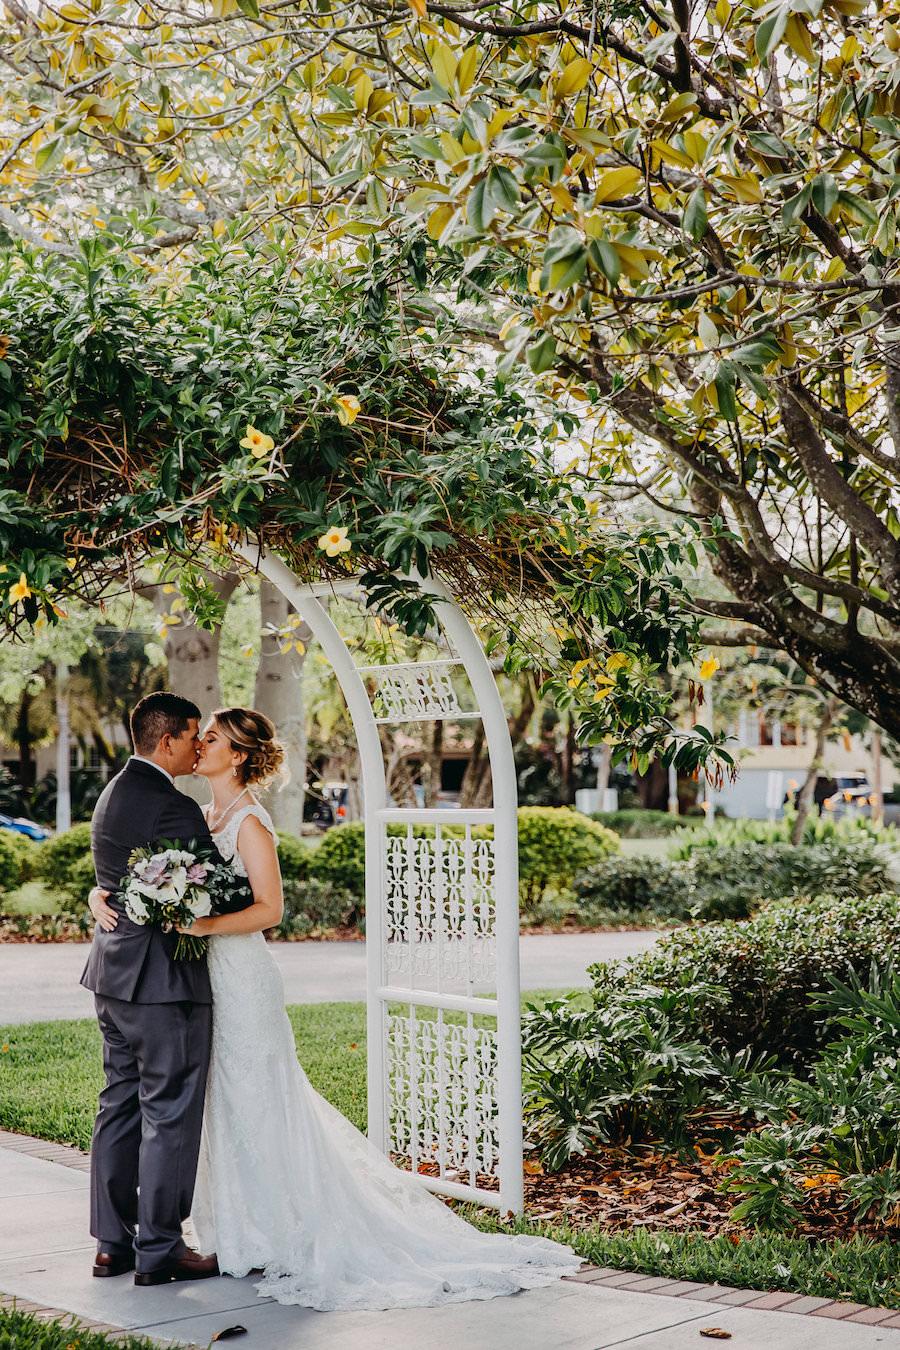 Bride and Groom Wedding Garden Portrait   Tampa Bay Wedding Photographer Rad Red Creative   Waterfront Venue Davis Islands Garden Club